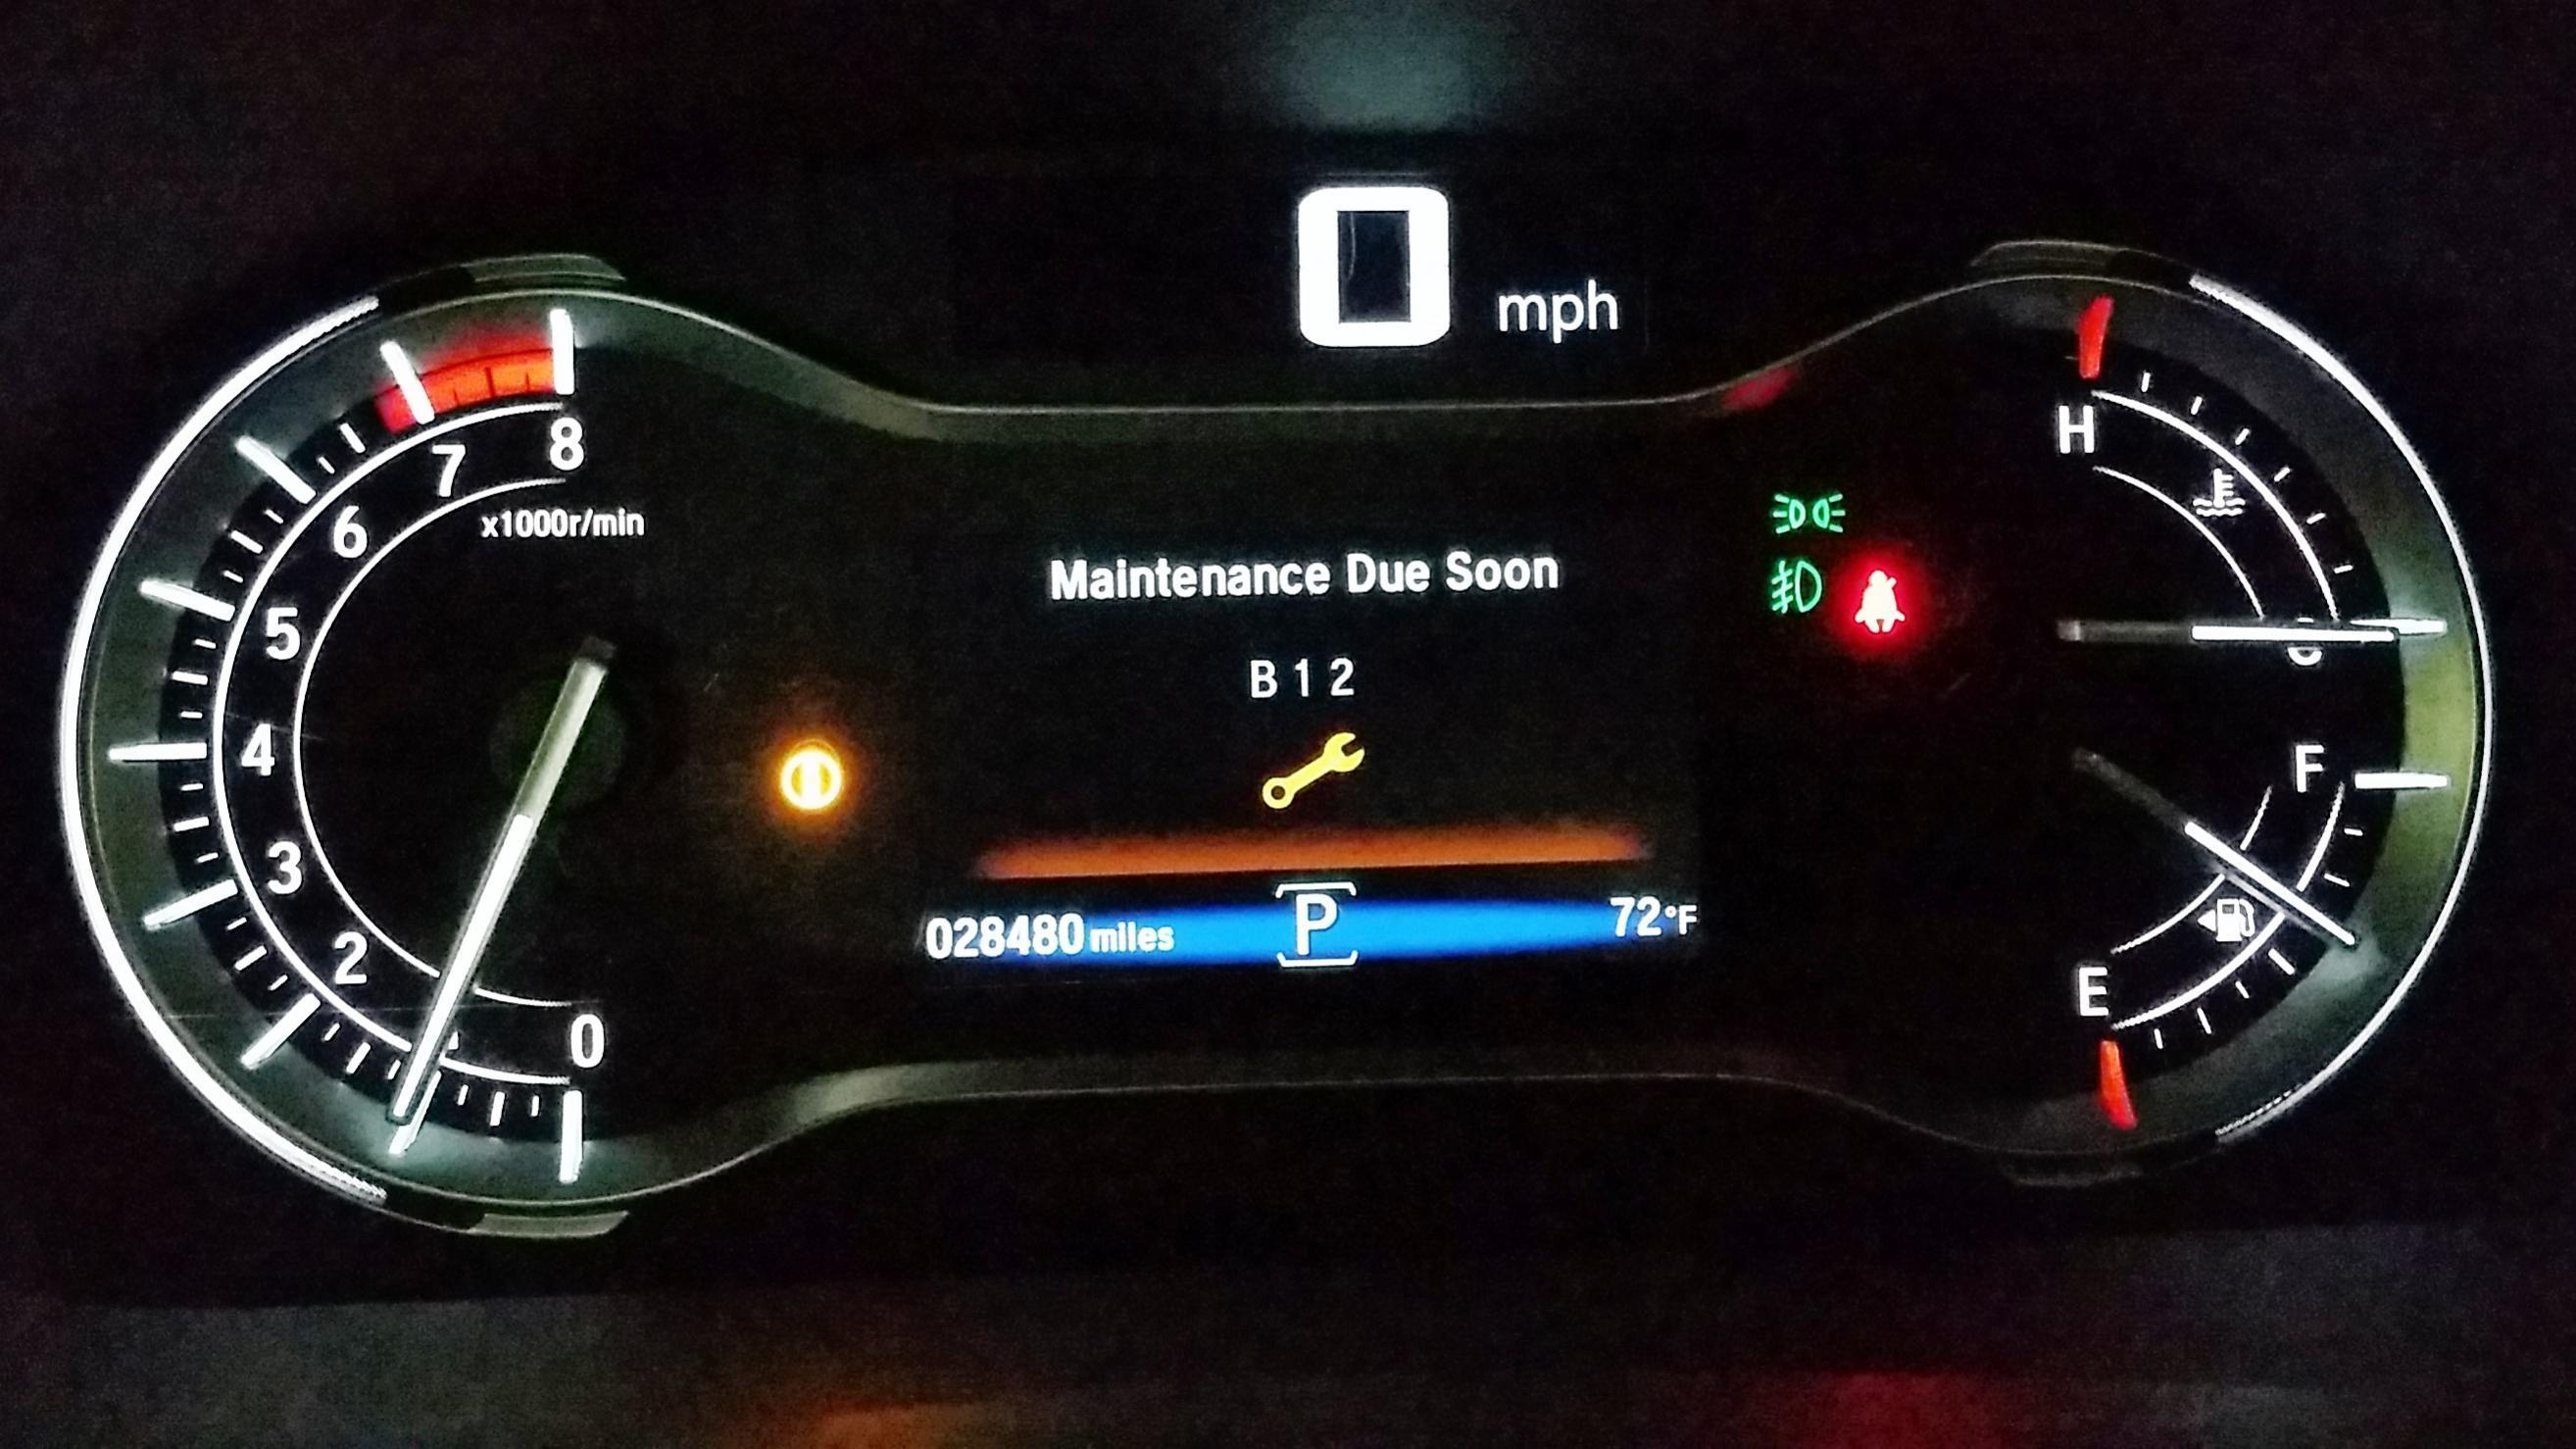 First 30K mile service or Maintenance Due Soon dash light Honda